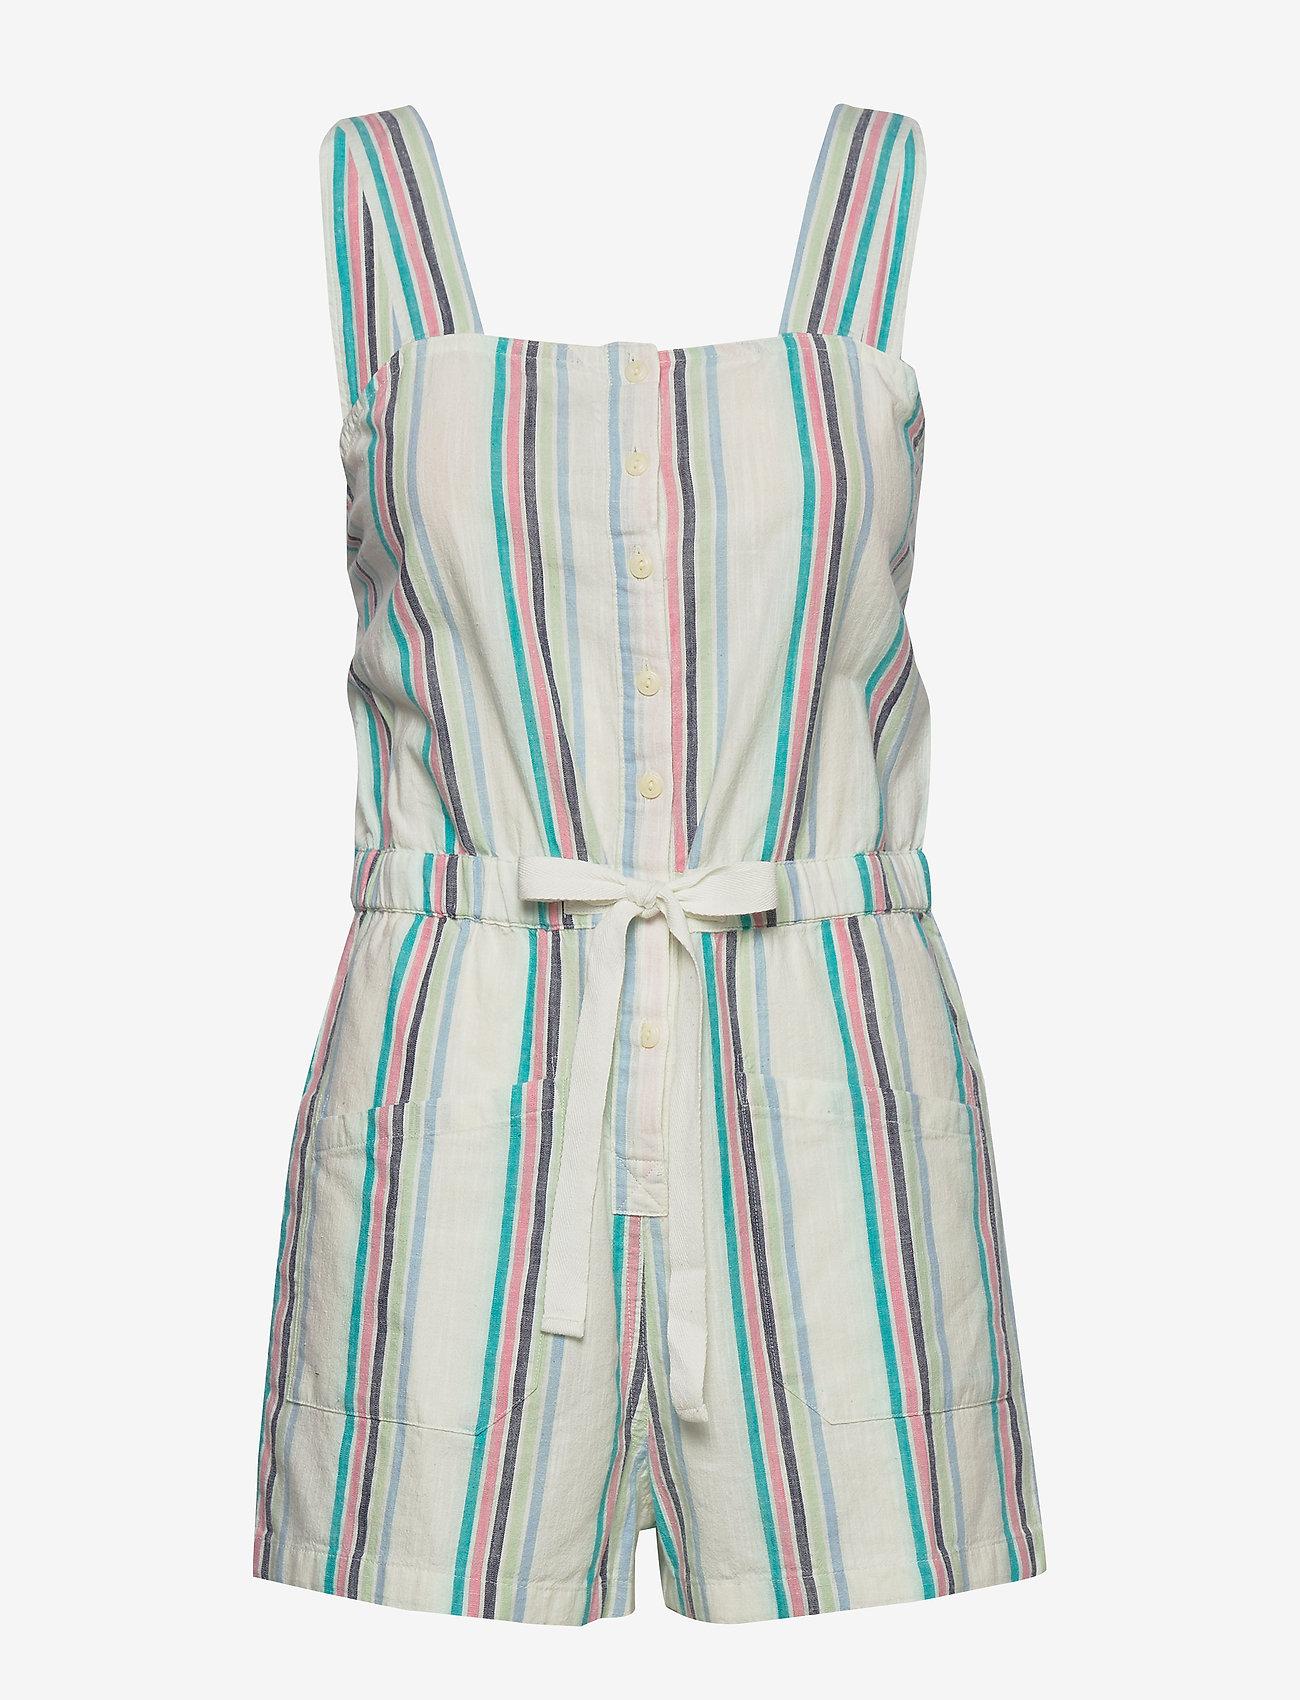 Lee Jeans - CAMI PLAYSUIT - buksedragter - bright white - 1